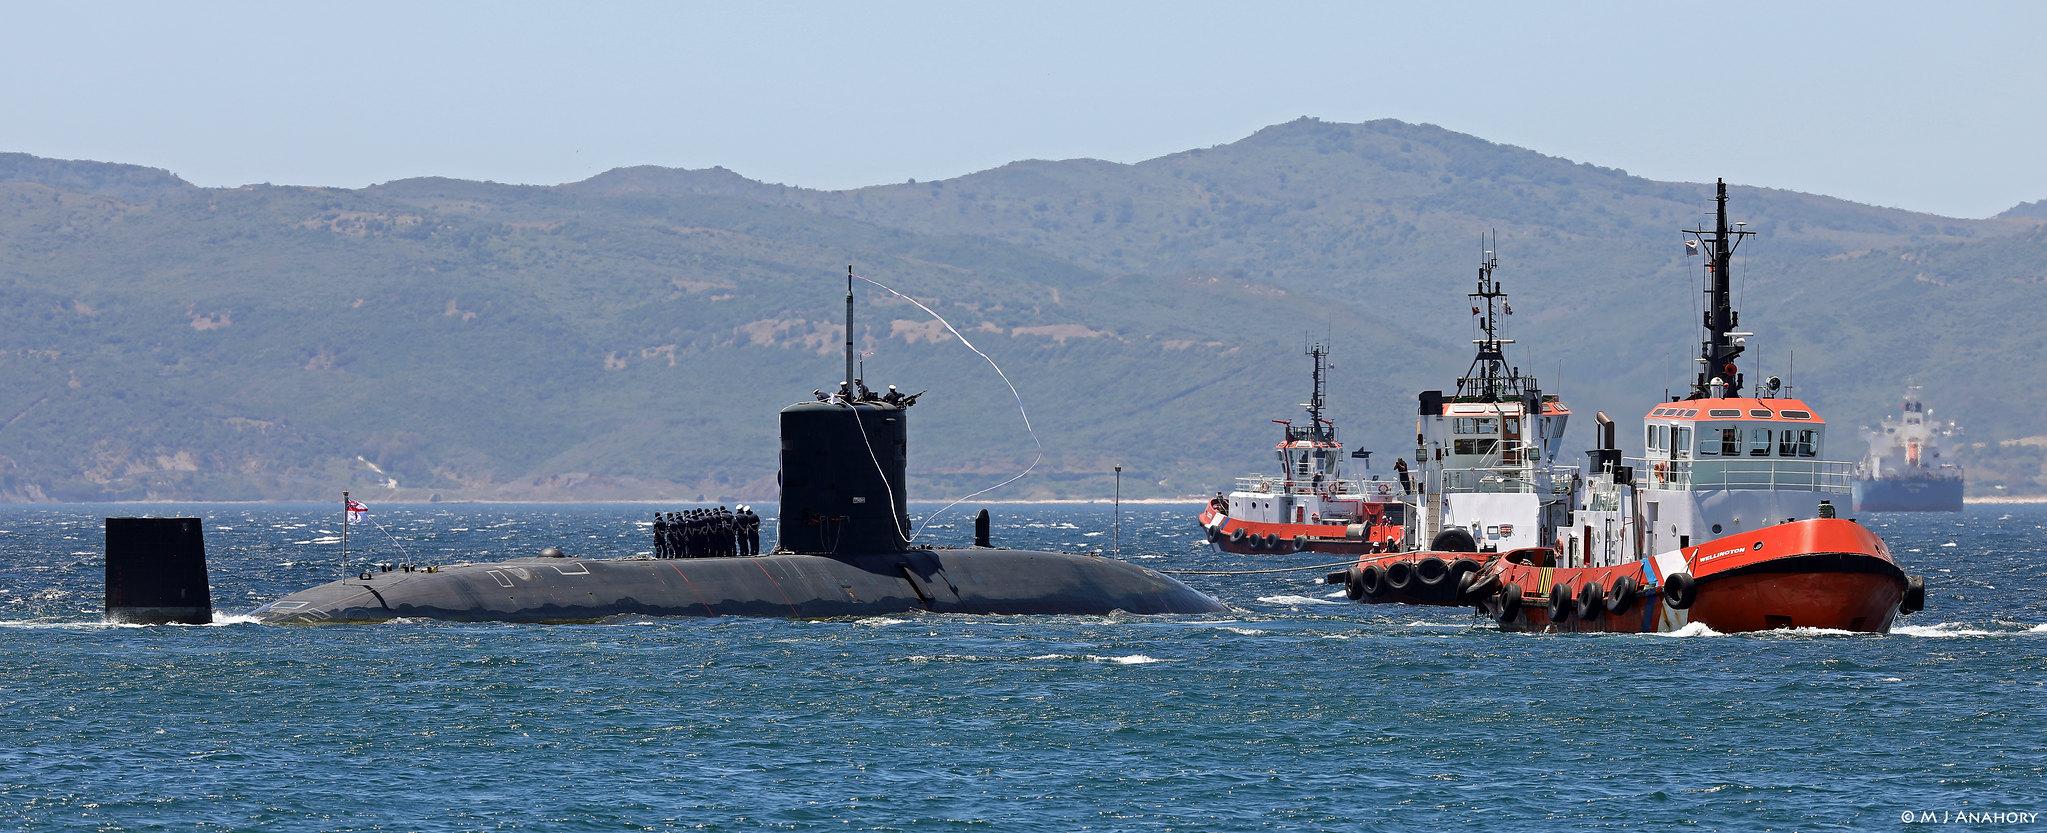 Trafalgar & Astute Class Submarine (SSN Fleet Submarines) - Page 2 34753863480_388d2b97ae_k